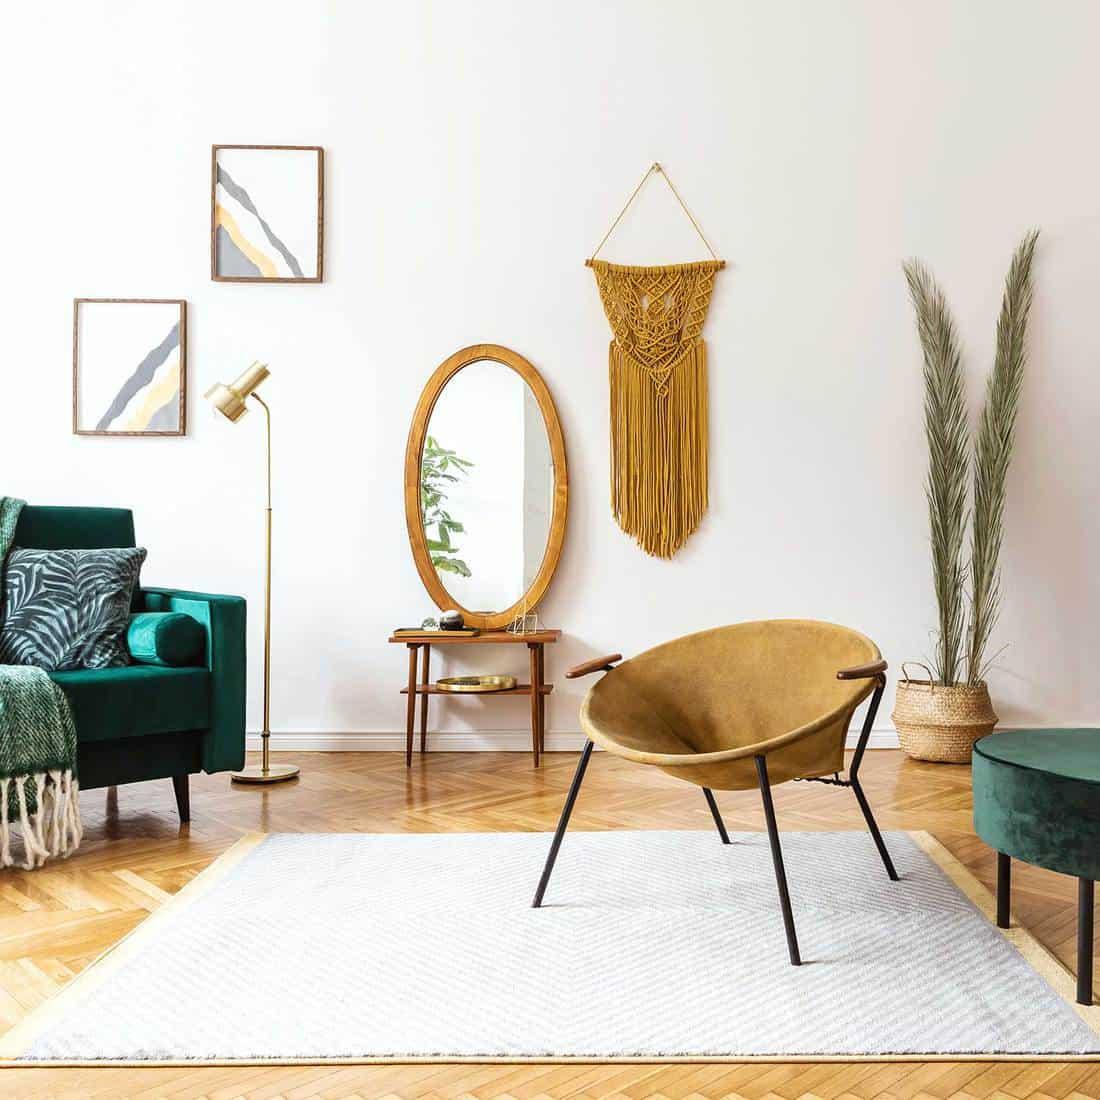 Stylish and elegant interior of living room with design gold armchair, velvet sofa, lamp, poster frames